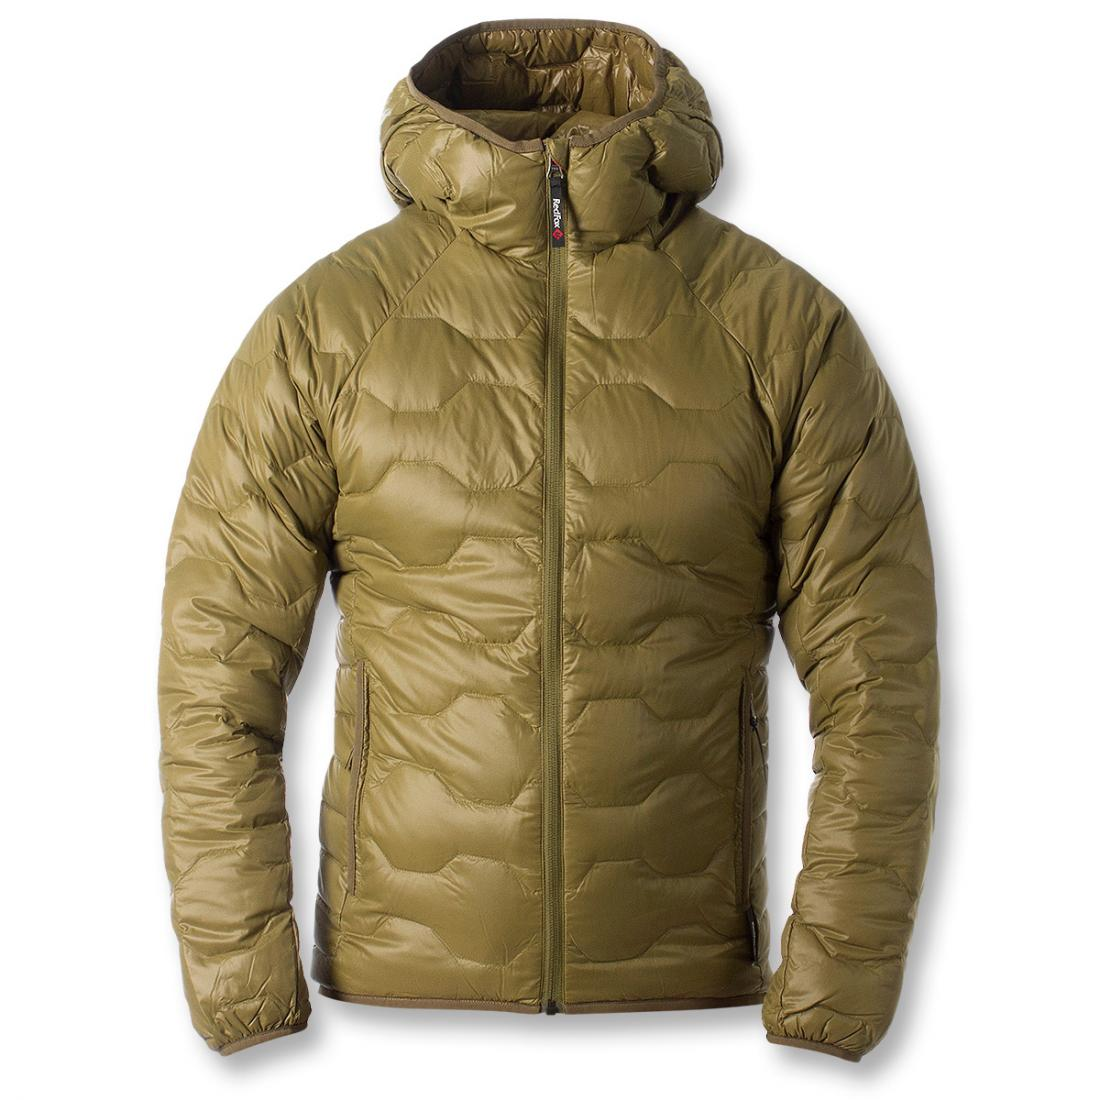 Куртка пуховая Belite III МужскаяКуртки<br><br><br>Цвет: Зеленый<br>Размер: 52